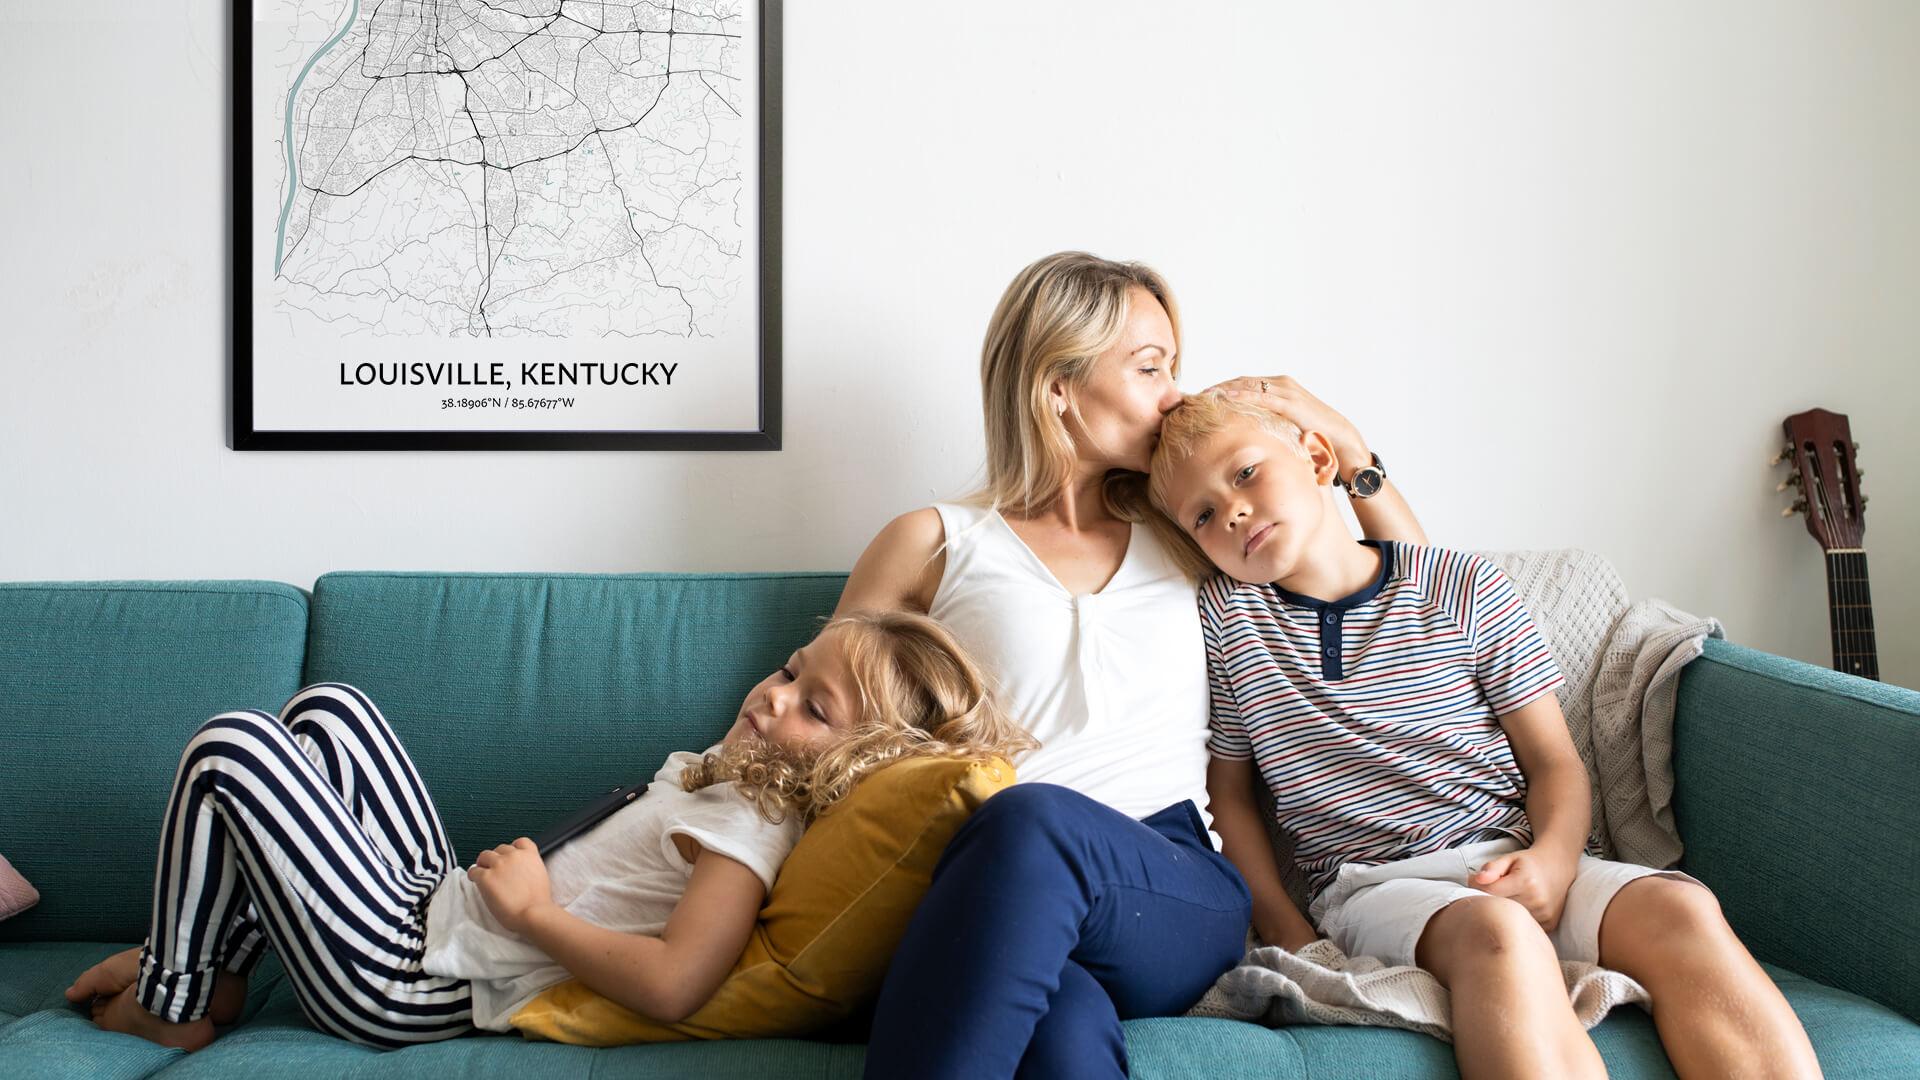 Louisville map poster